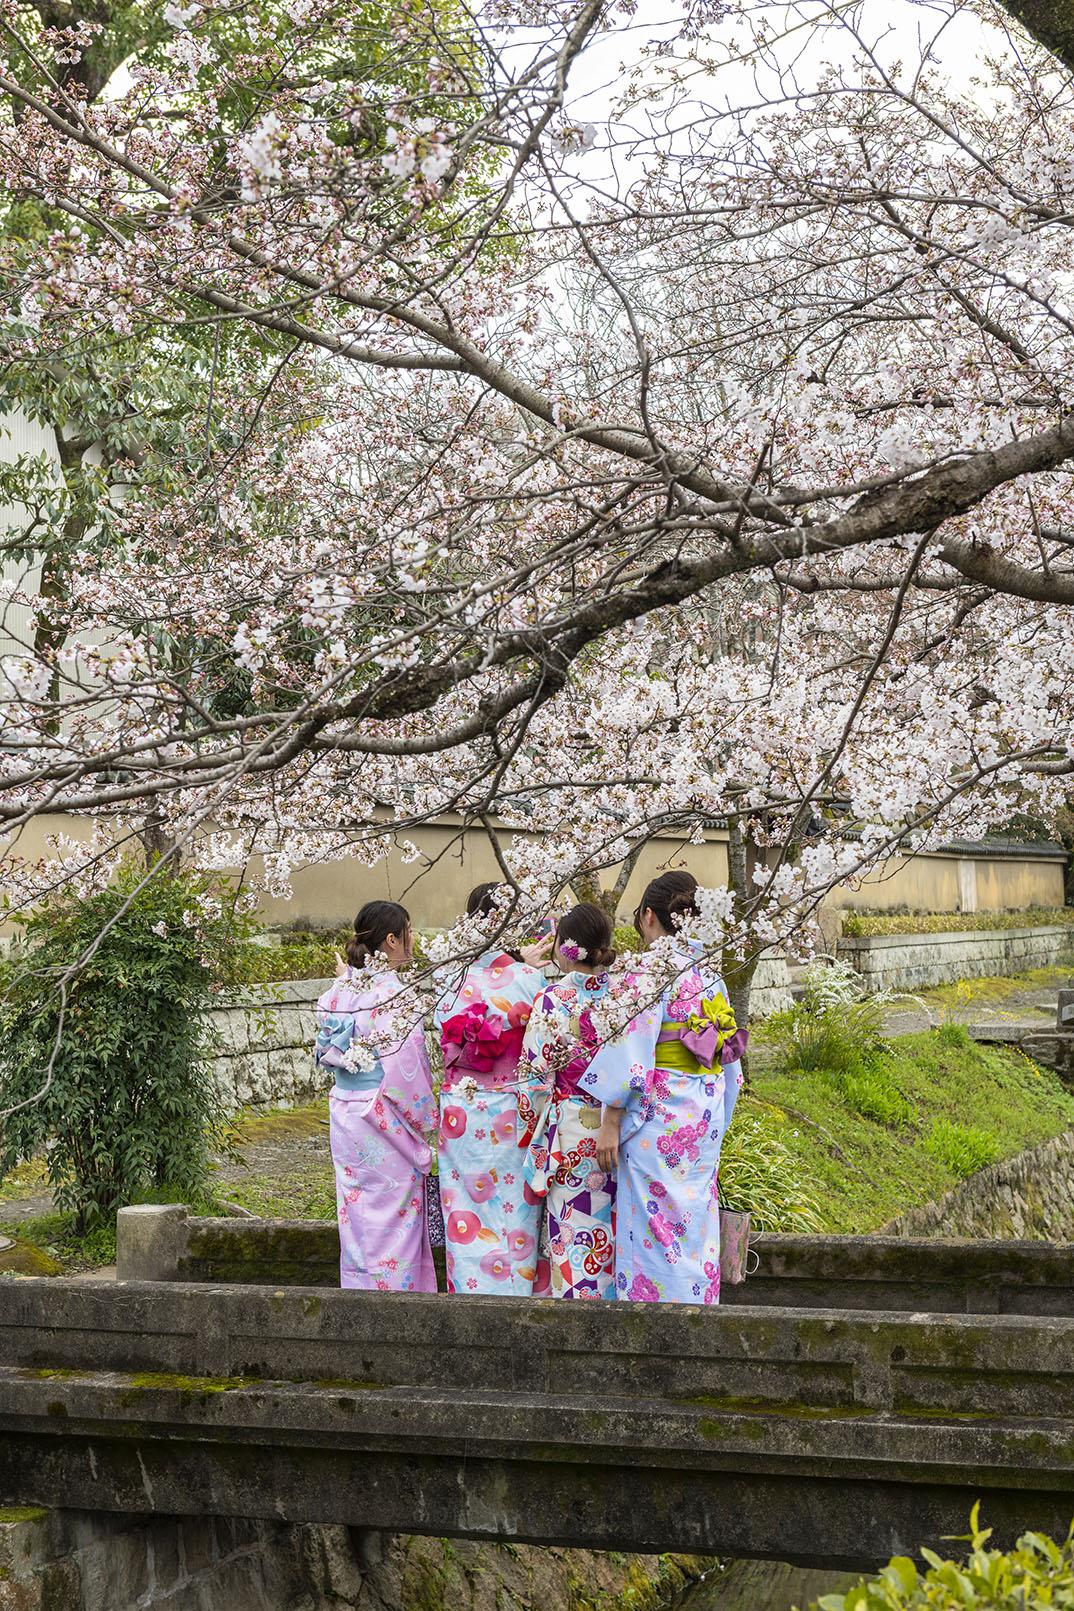 philosophers-path-japan-cheery-blossom